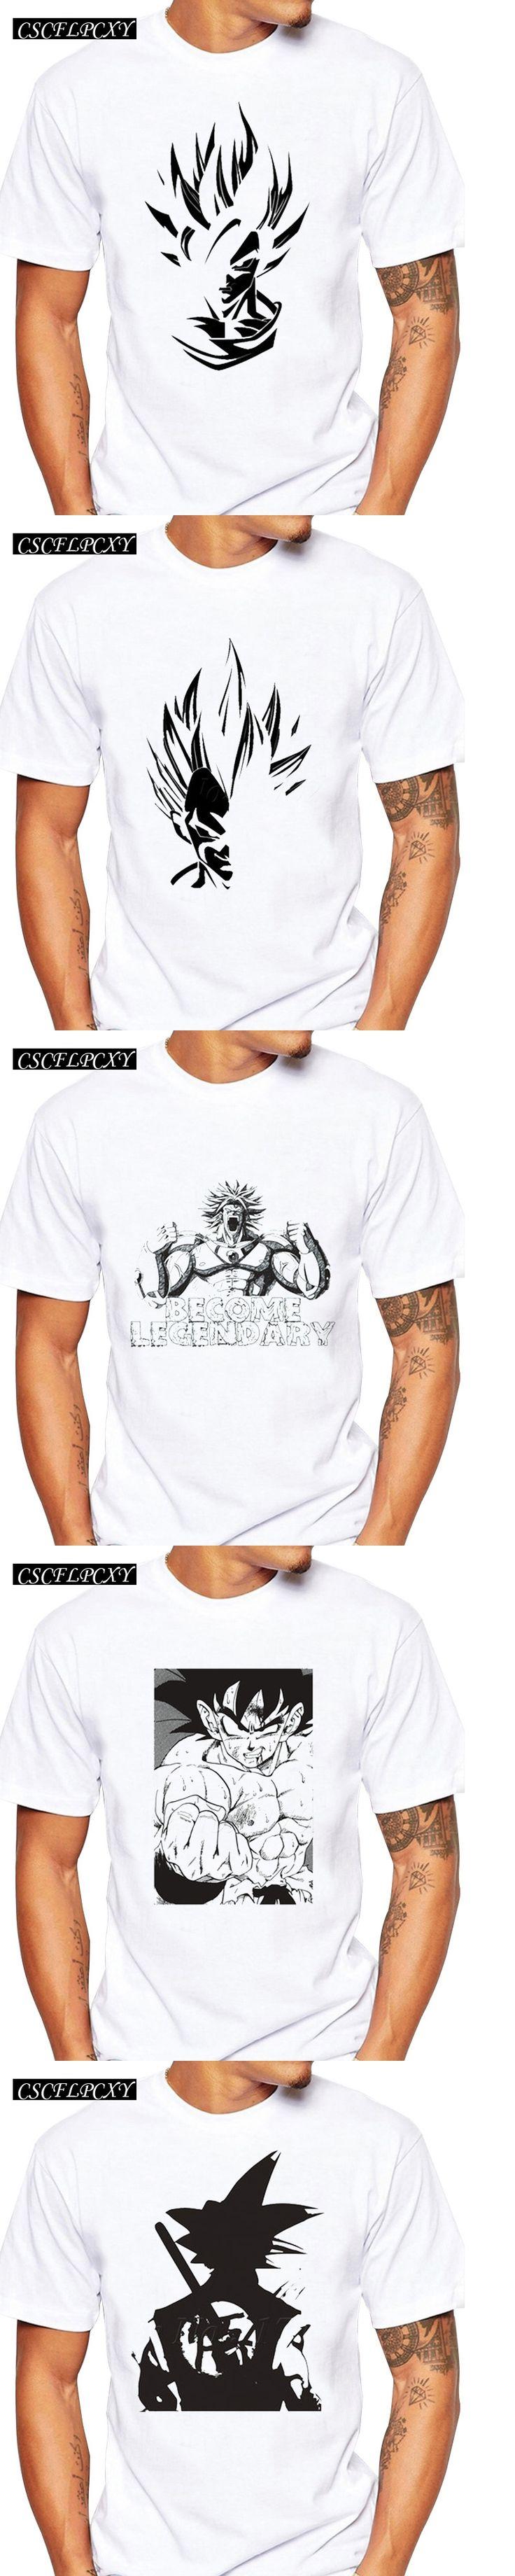 2017 New Famous The Dragon Ball Z Men Cloths Son Goku Super Saiyan Printed Basic T Shirt Fashion White Black Simple Tee For Male